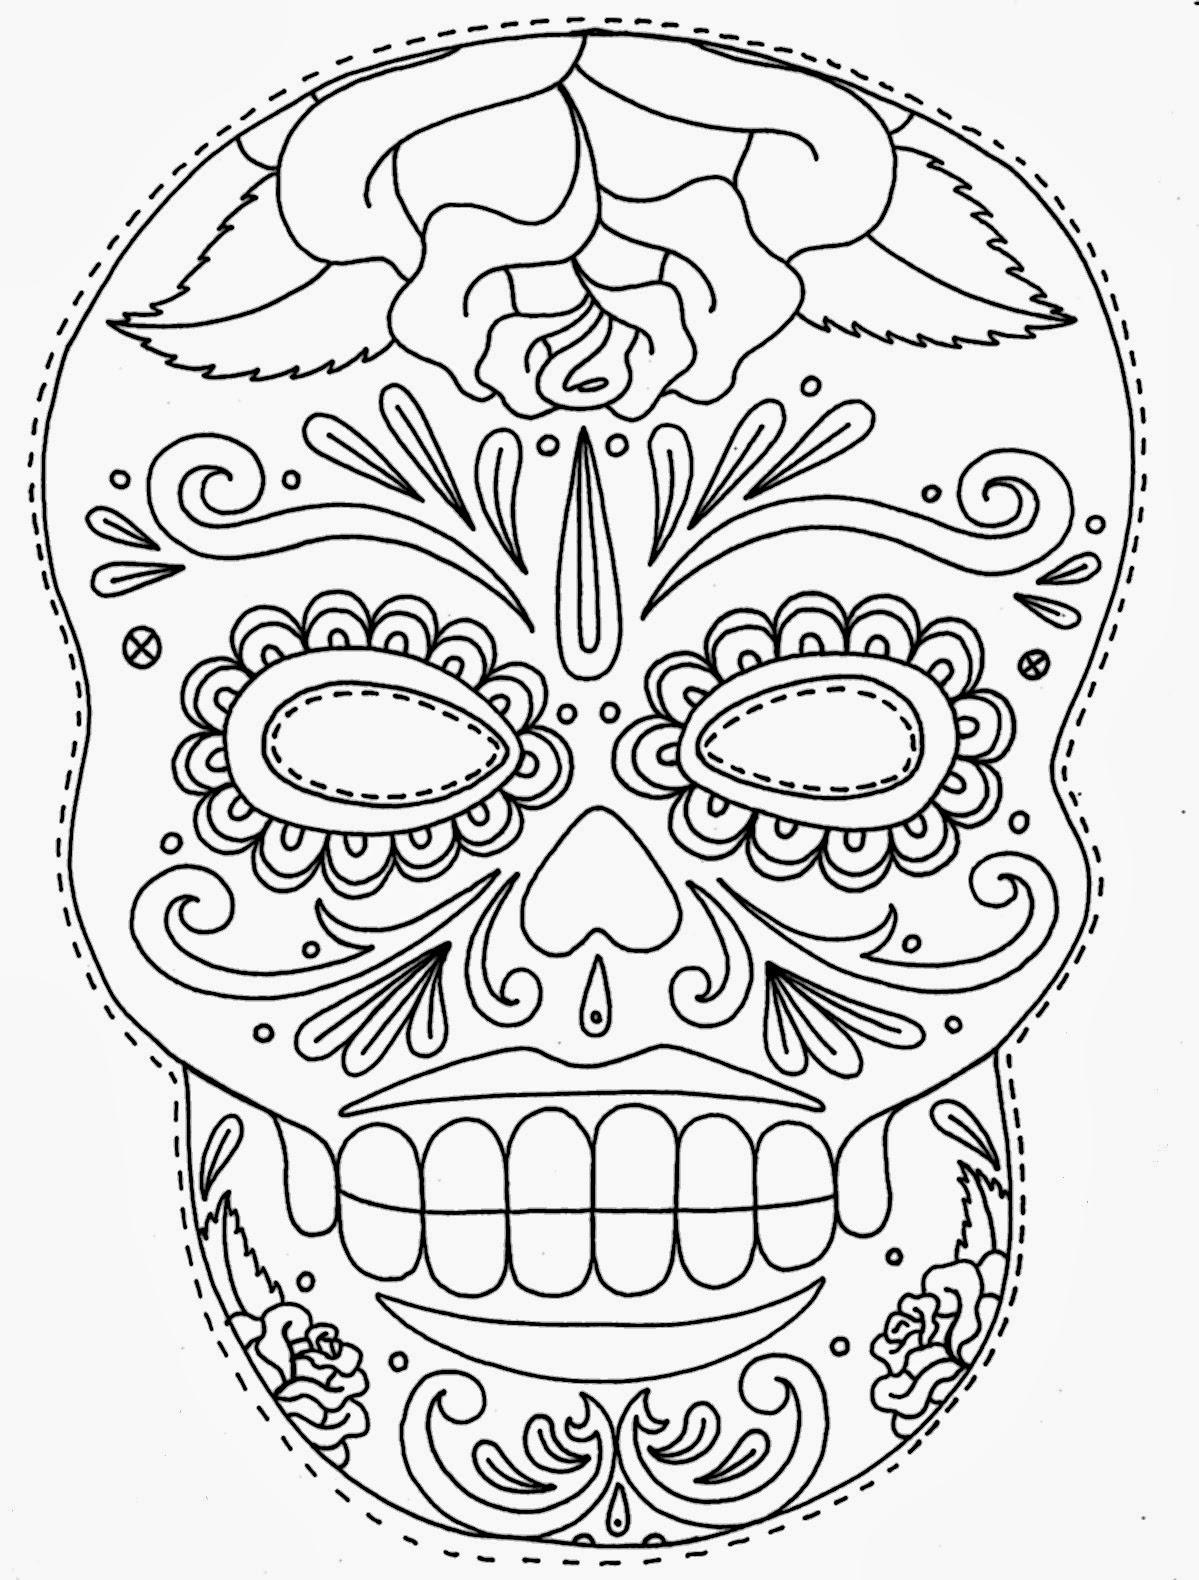 day of the dead skull mask template - tattoos book 2510 free printable tattoo stencils skulls